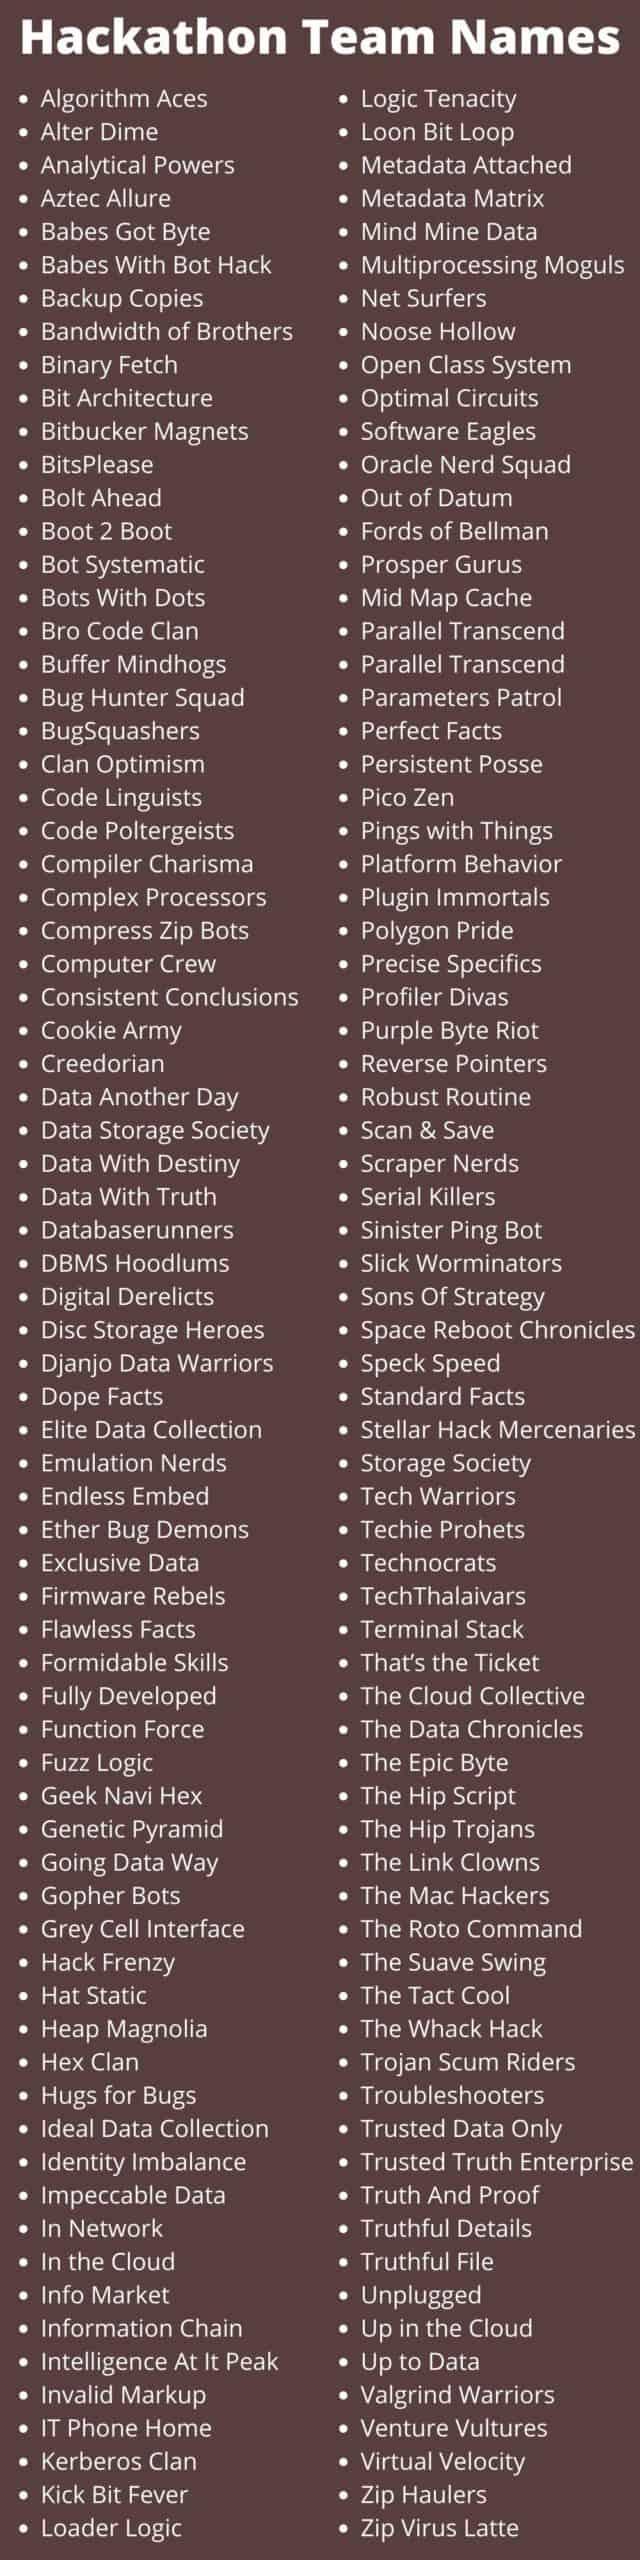 Hackathon Team Names